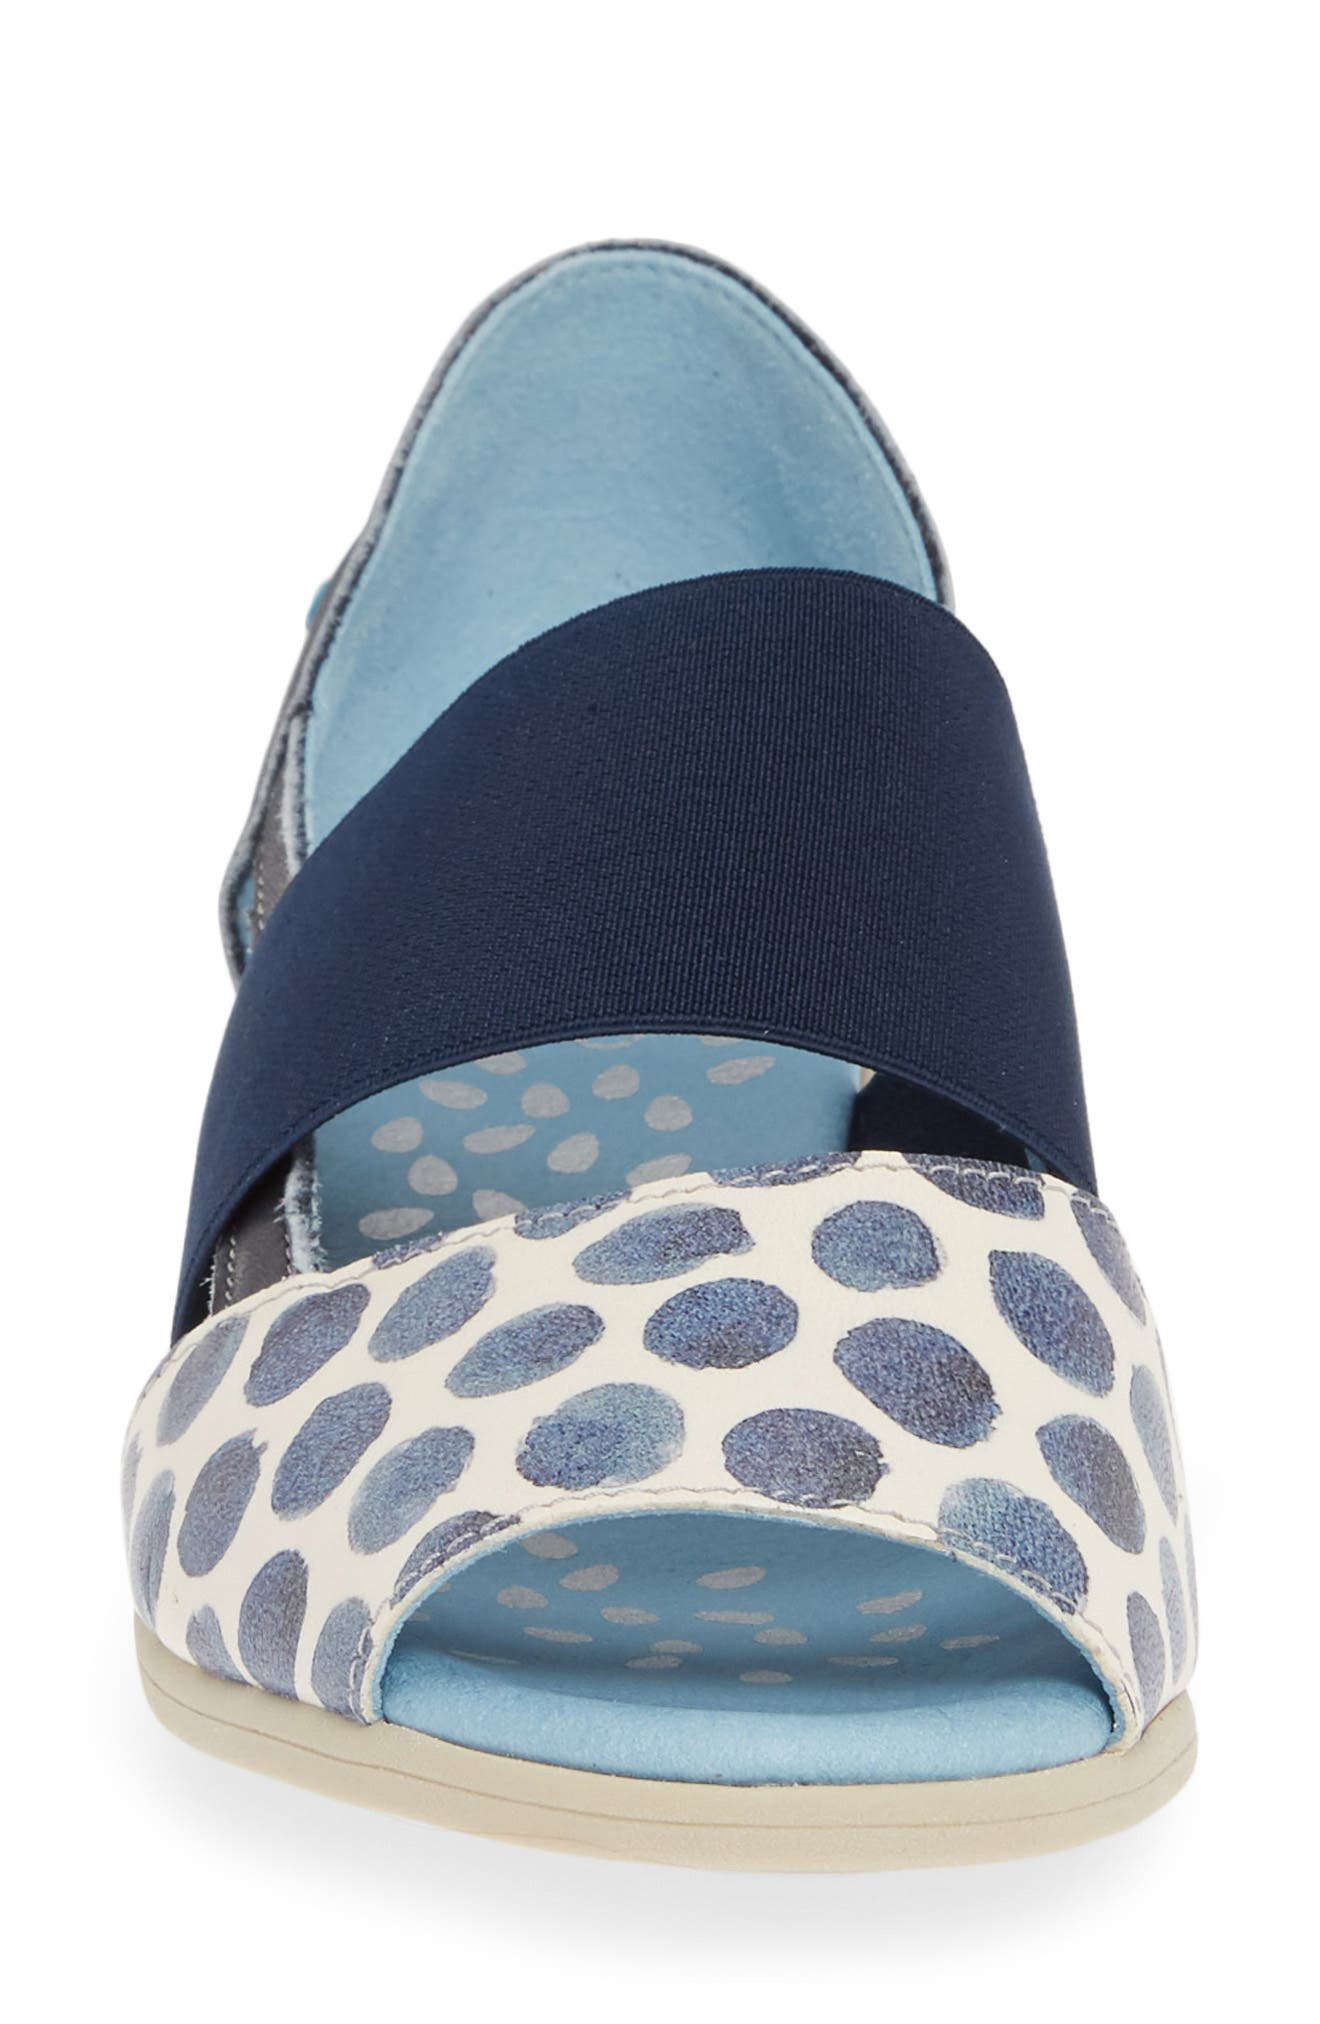 CLOUD,                             'Canary' Skimmer Sandal,                             Alternate thumbnail 4, color,                             TUPAI BLUE LEATHER